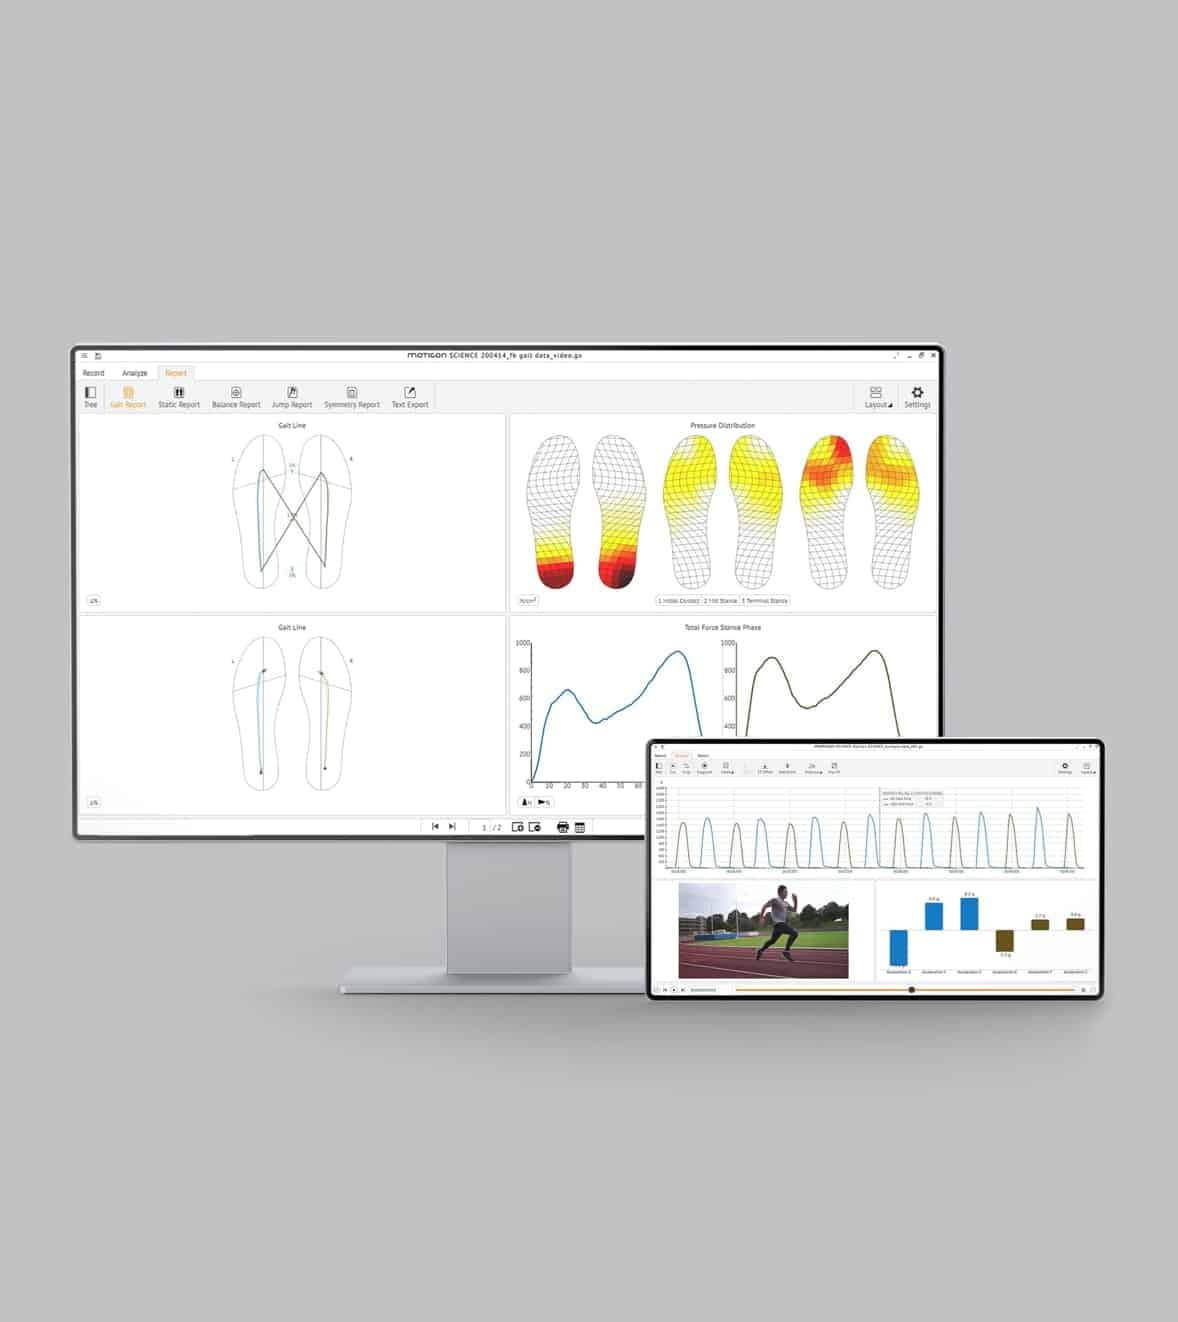 moticon-opengo-science-software